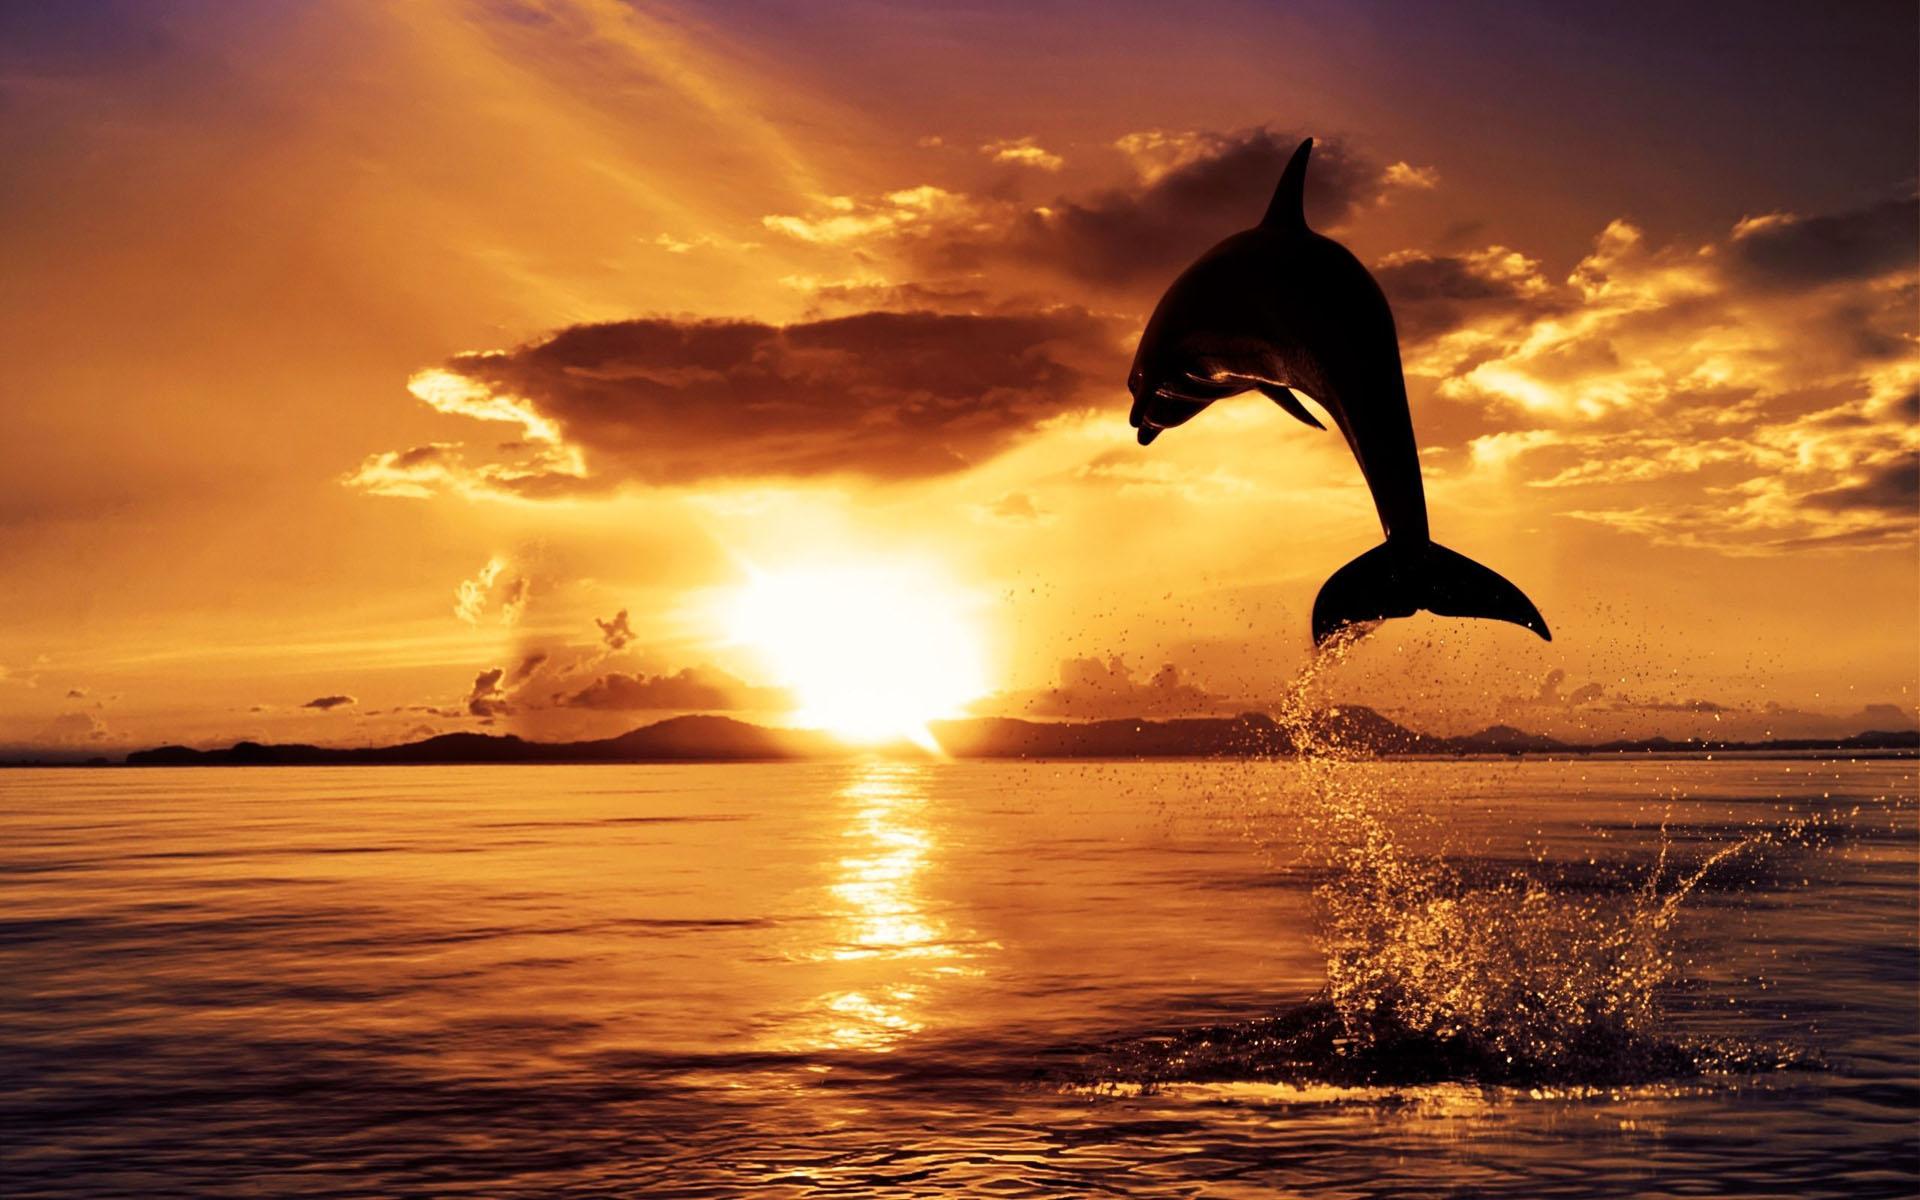 Dolphin in Sunset HD Desktop Wallpaper HD Desktop Wallpaper 1920x1200